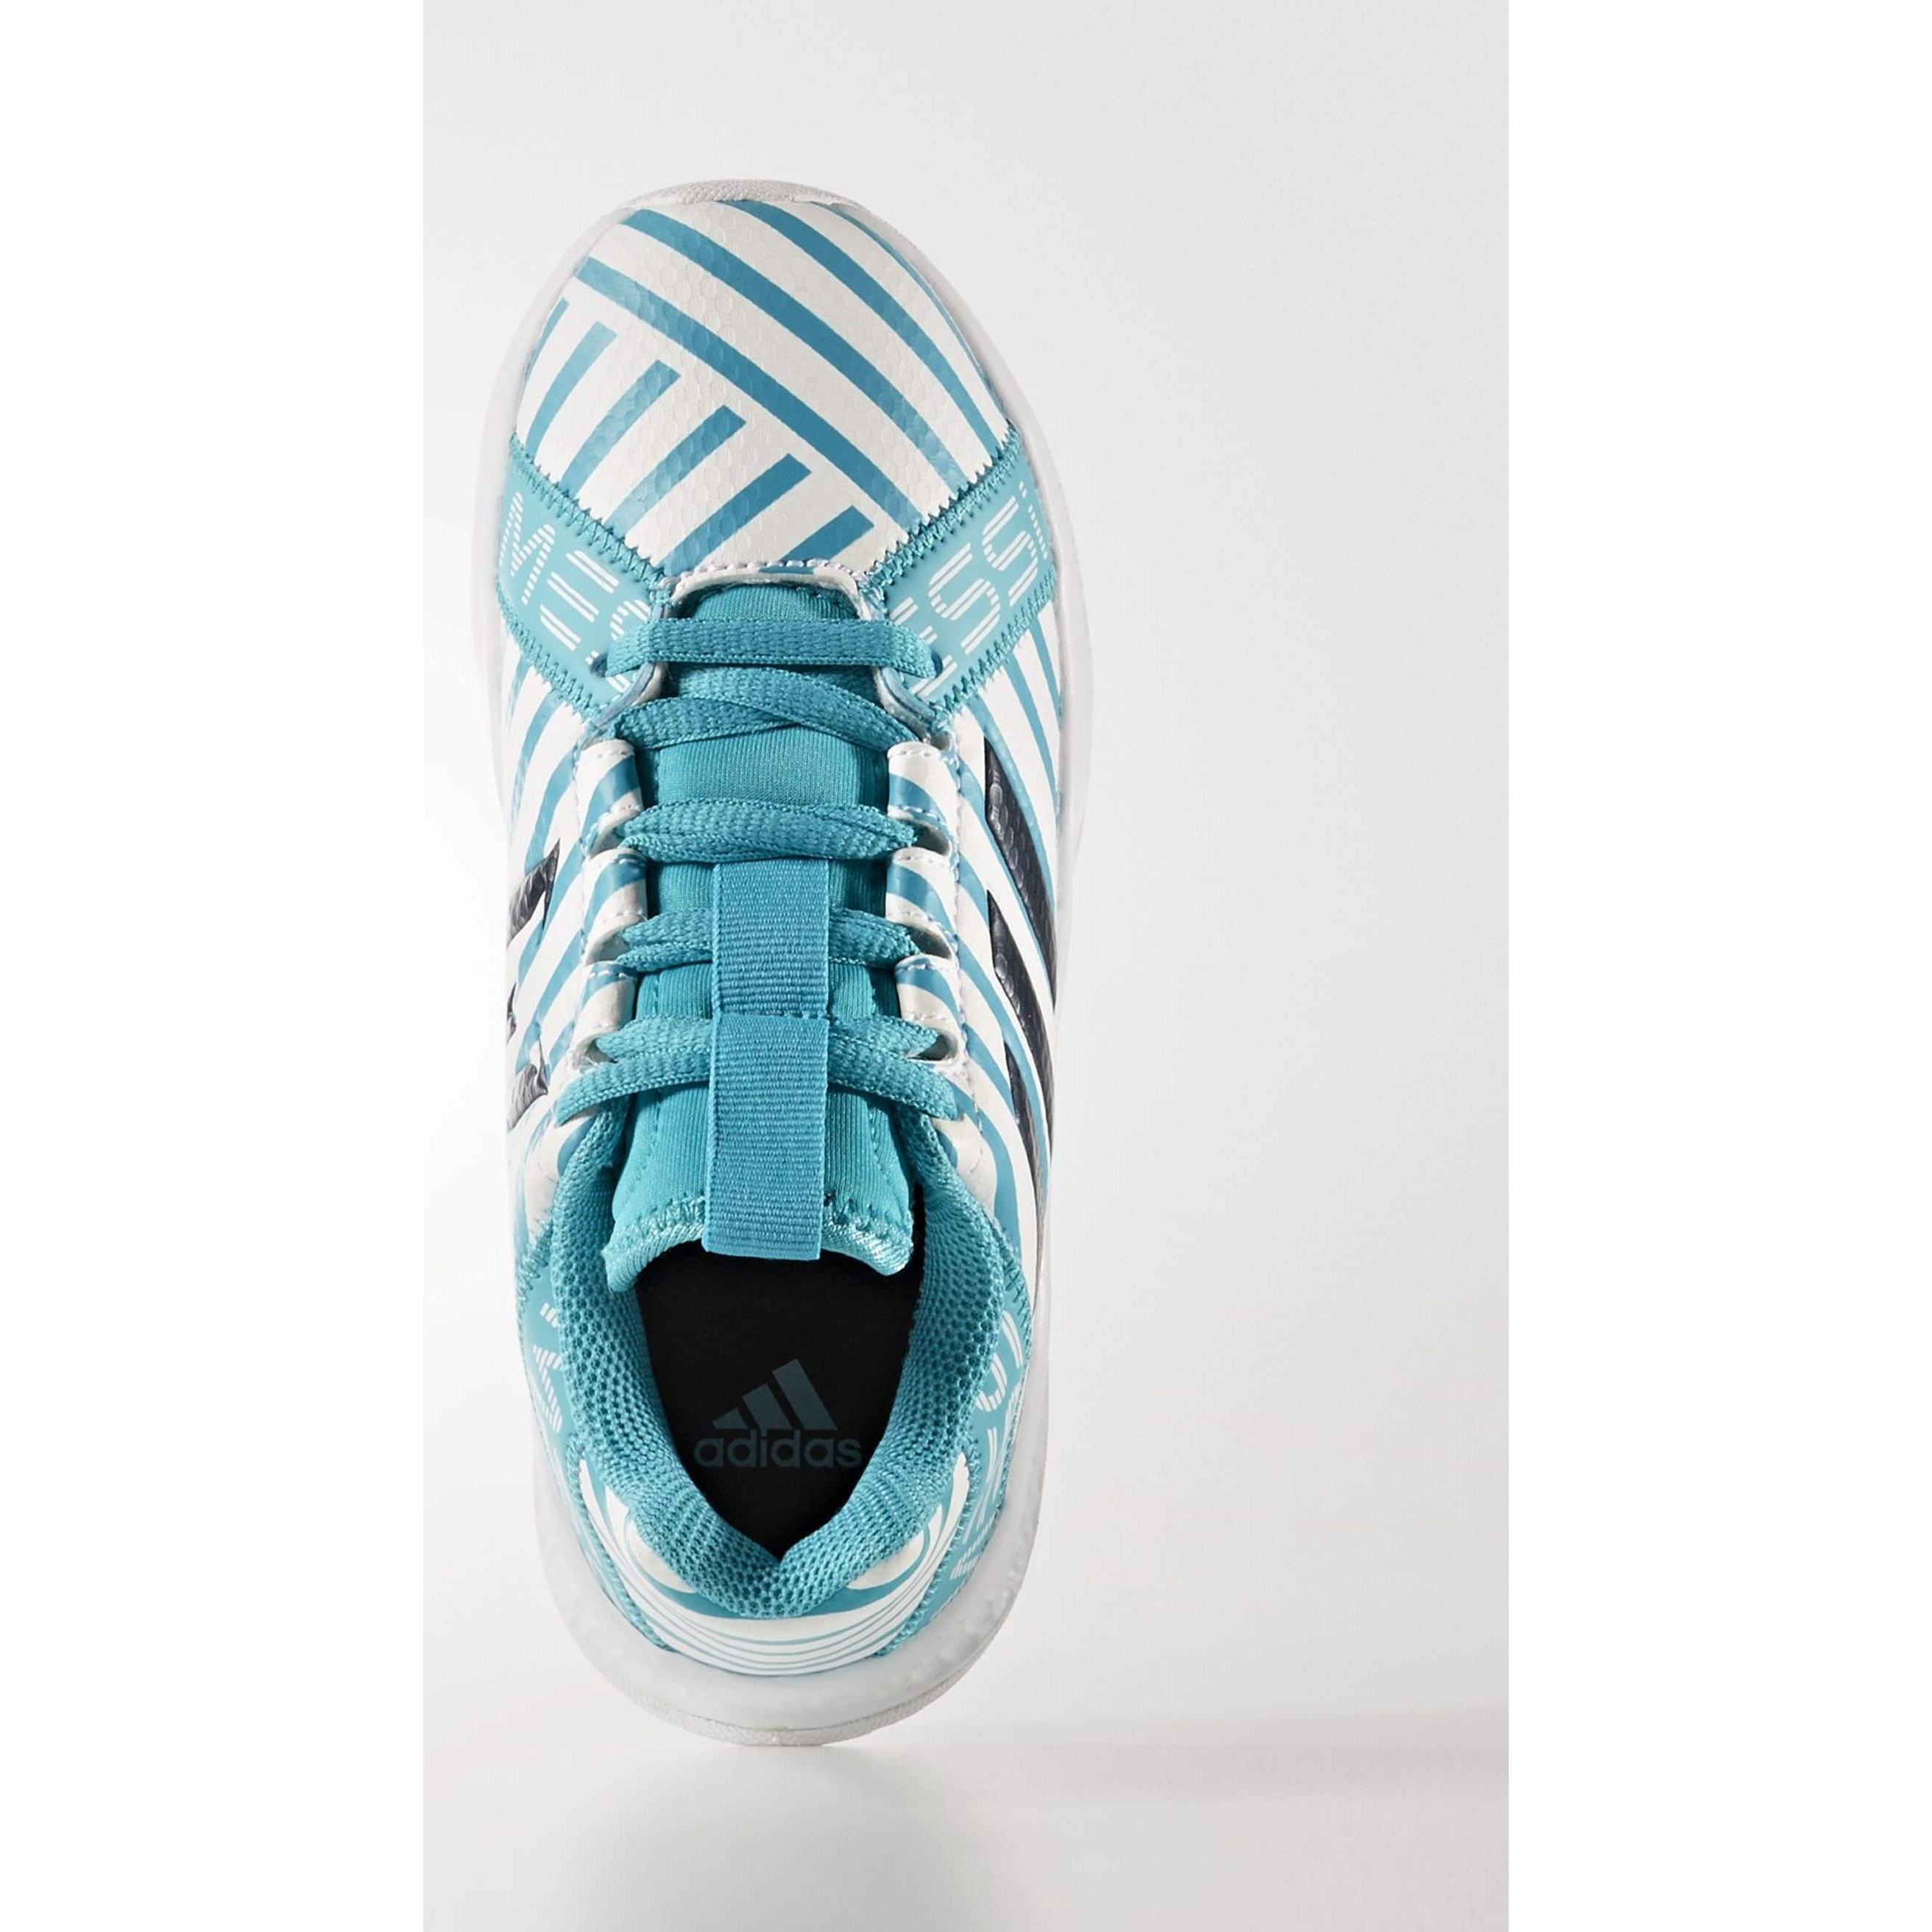 کفش فوتبال بندی پسرانه RapidaTurf Messi - آدیداس - آبی و سفید - 3